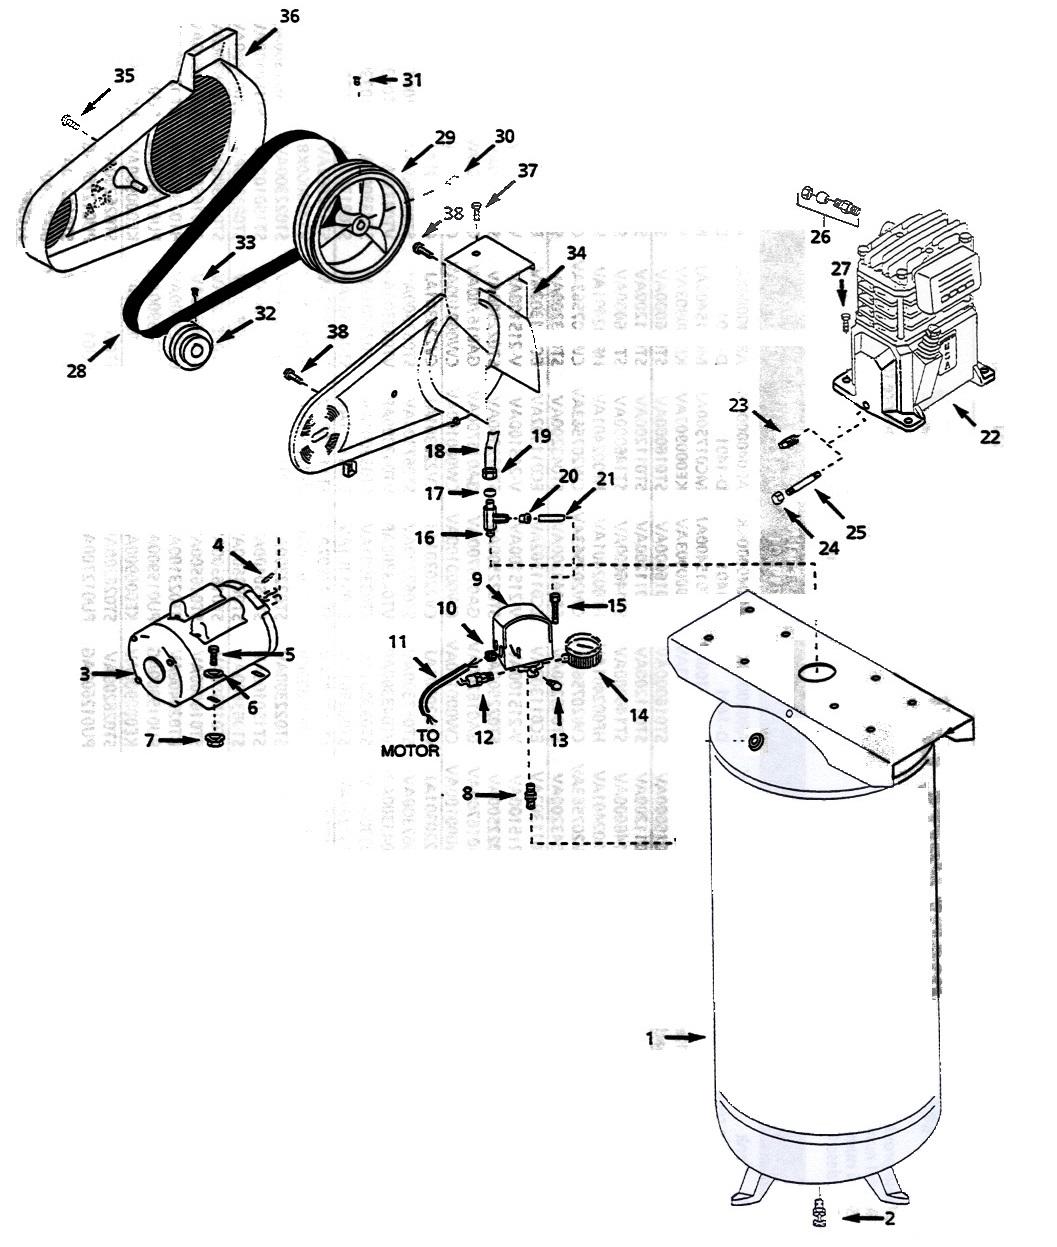 7400 air tank schematic 7400 nand gate data sheet wiring diagrams air compressor pumps campbell hausfeld vt4923 pump www remington 7400 takedown guide 7400 air tank schematic publicscrutiny Choice Image